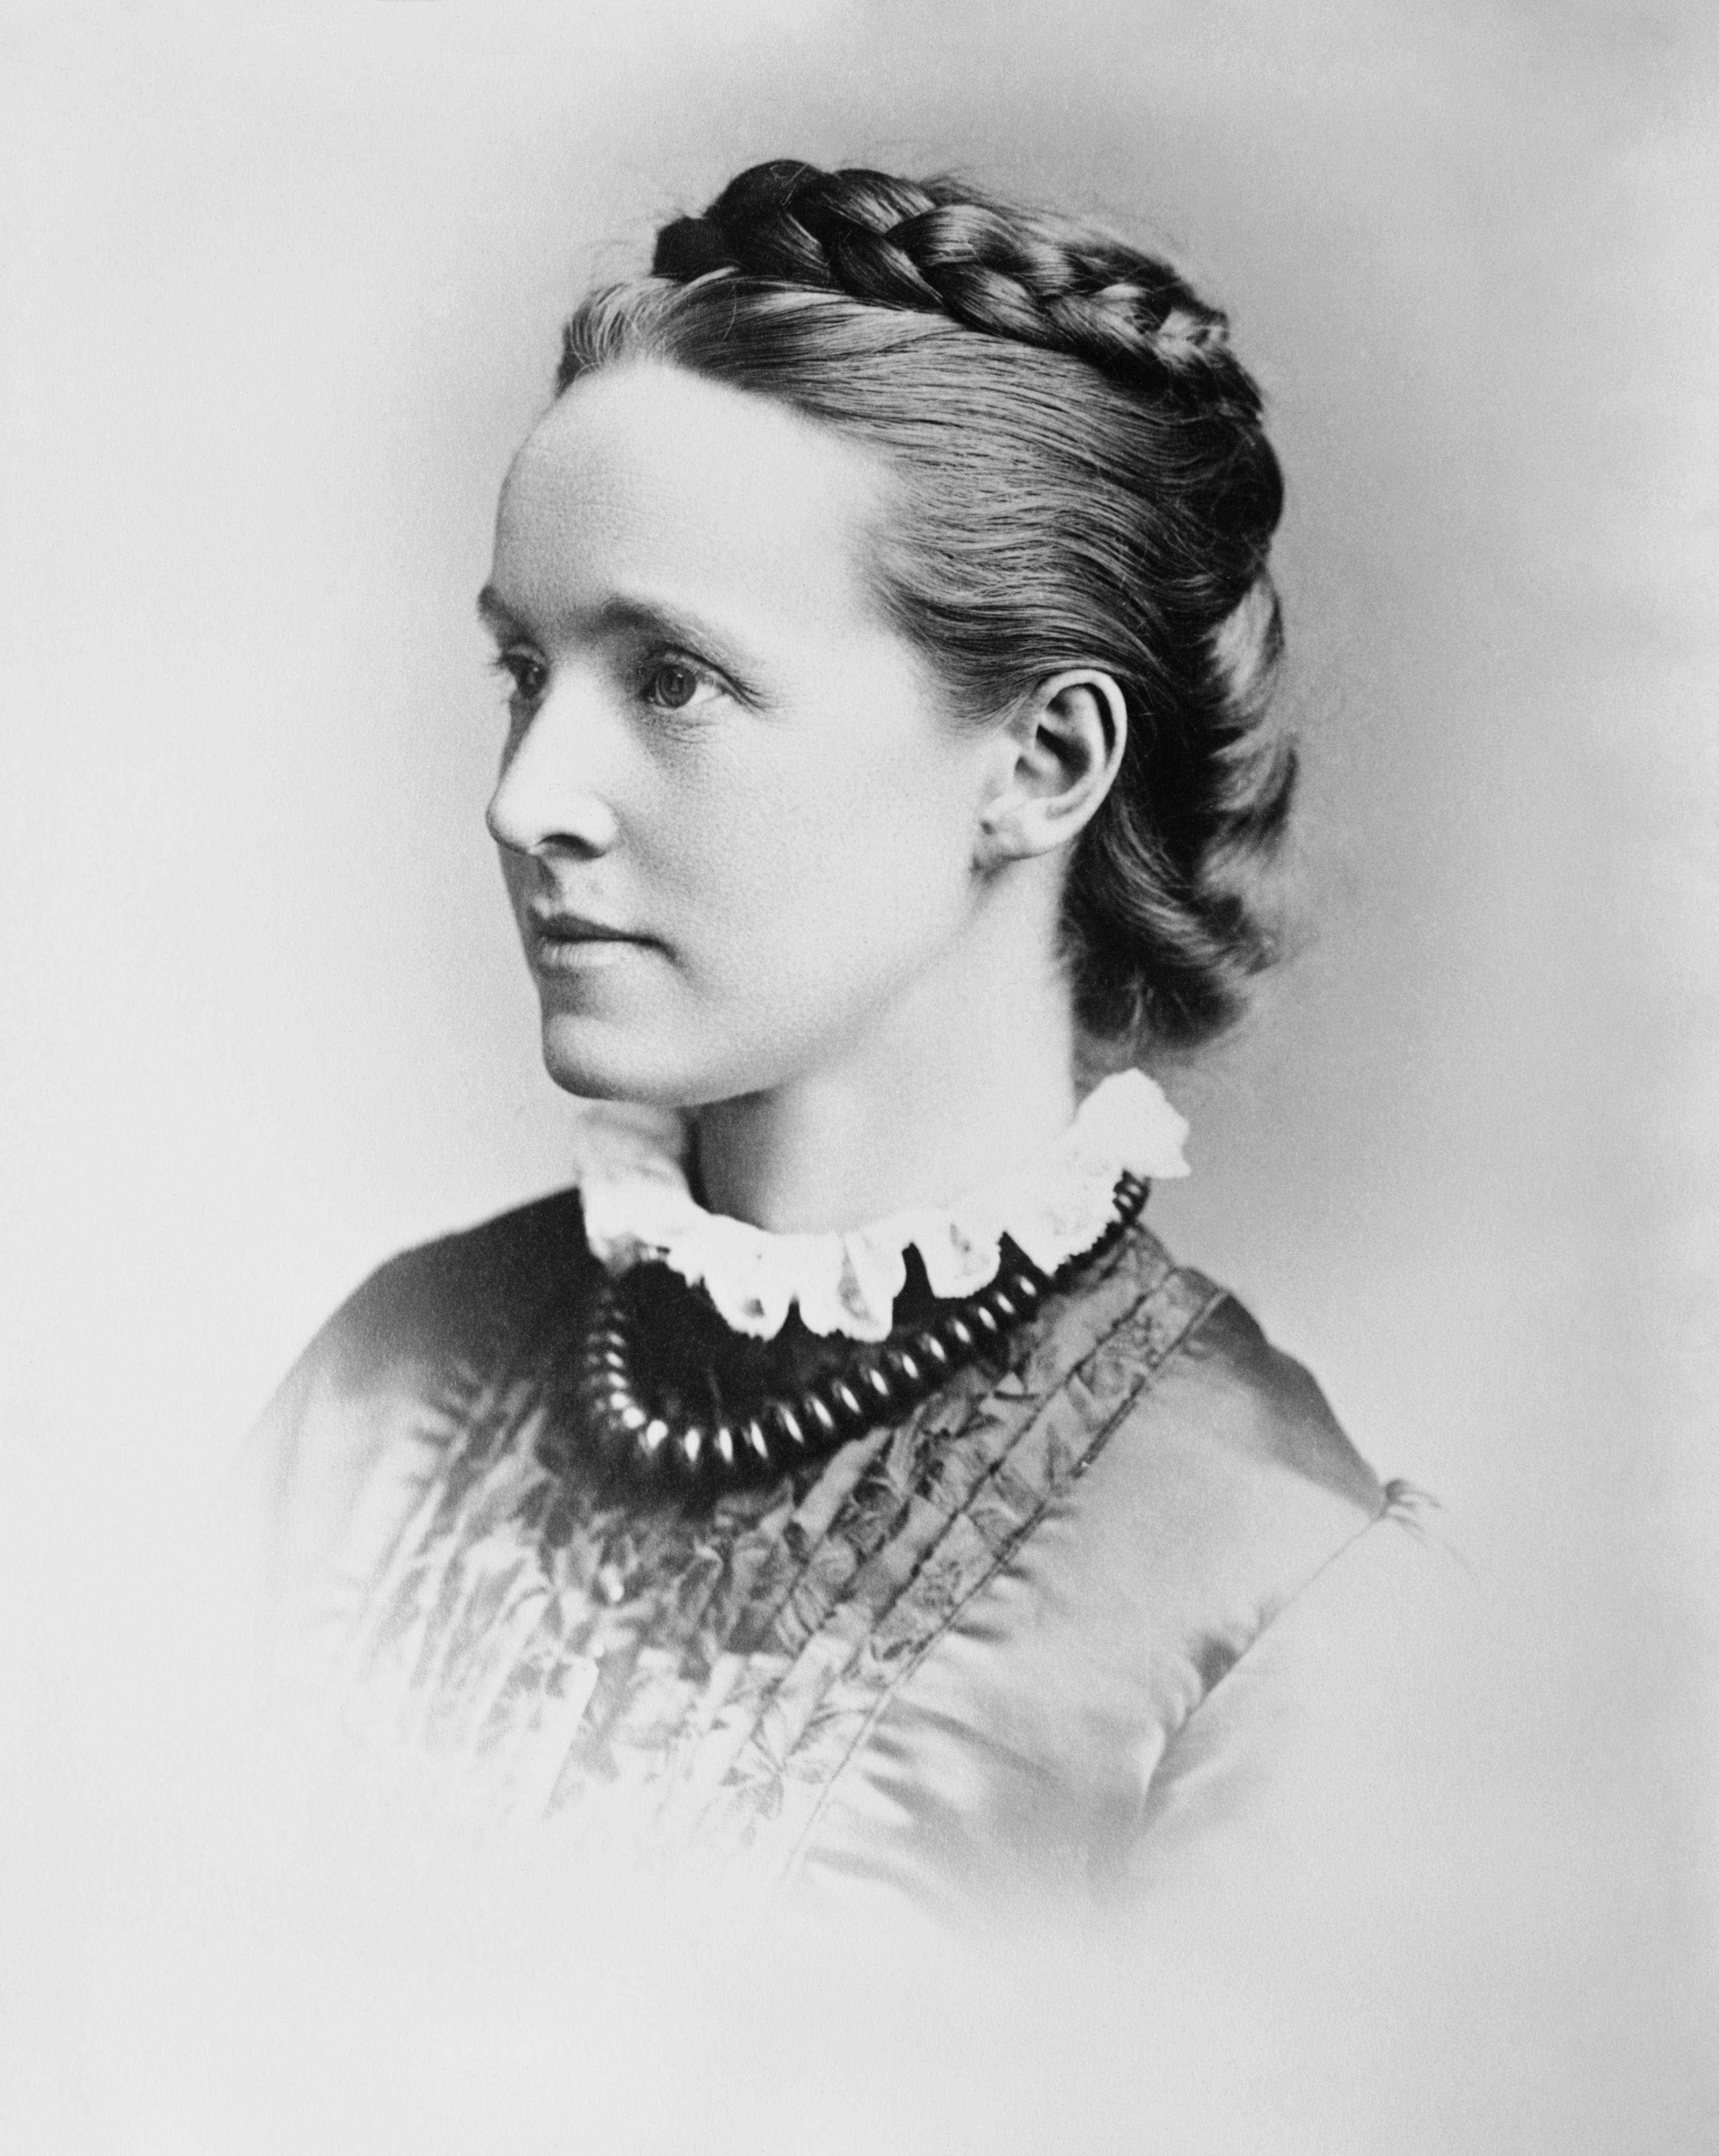 Millicent Fawcett, 1913